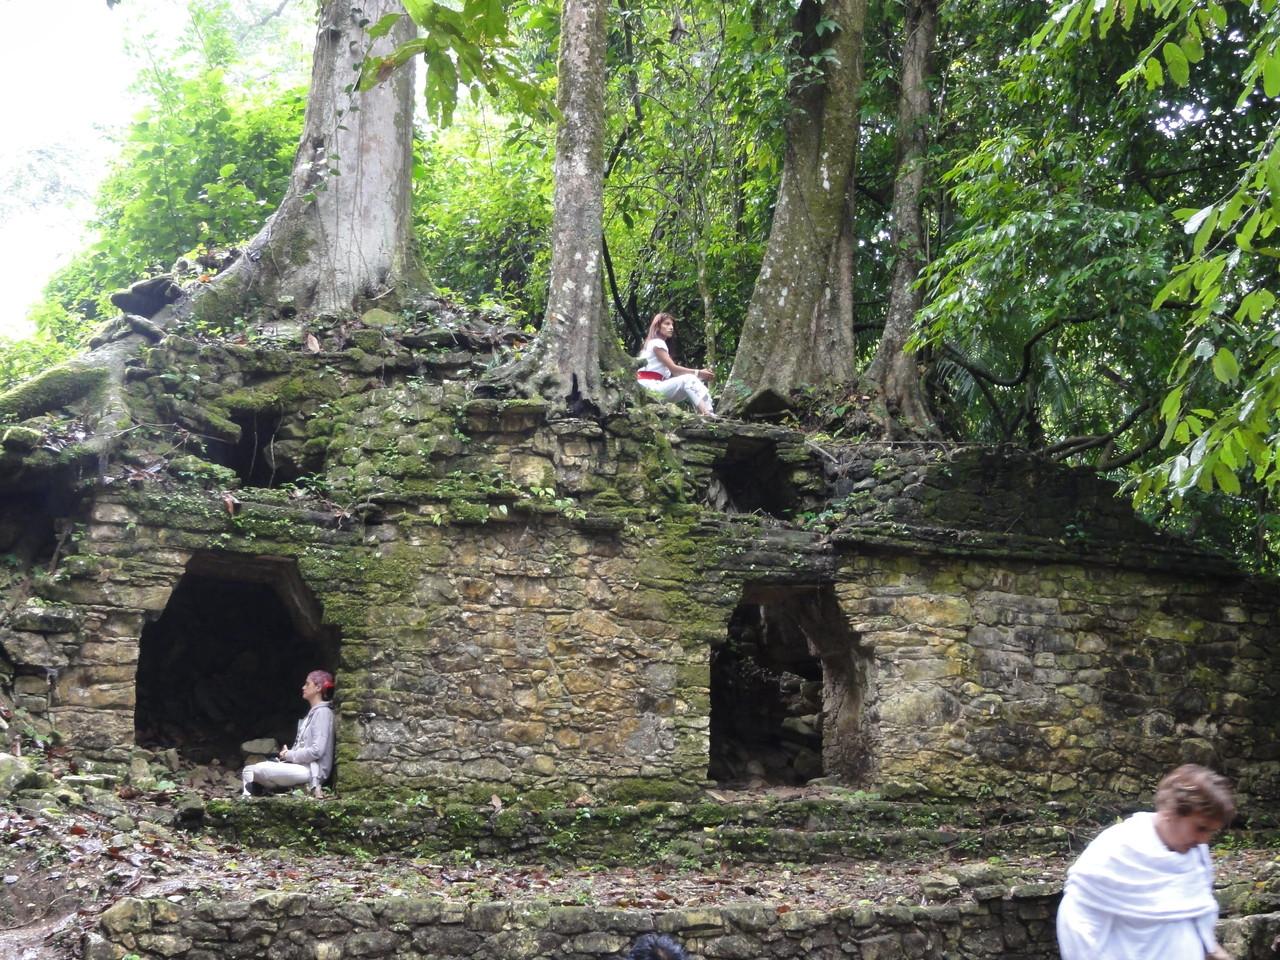 finally we reached our goal: Palenque / finalmente llegamos a la meta: Palenque